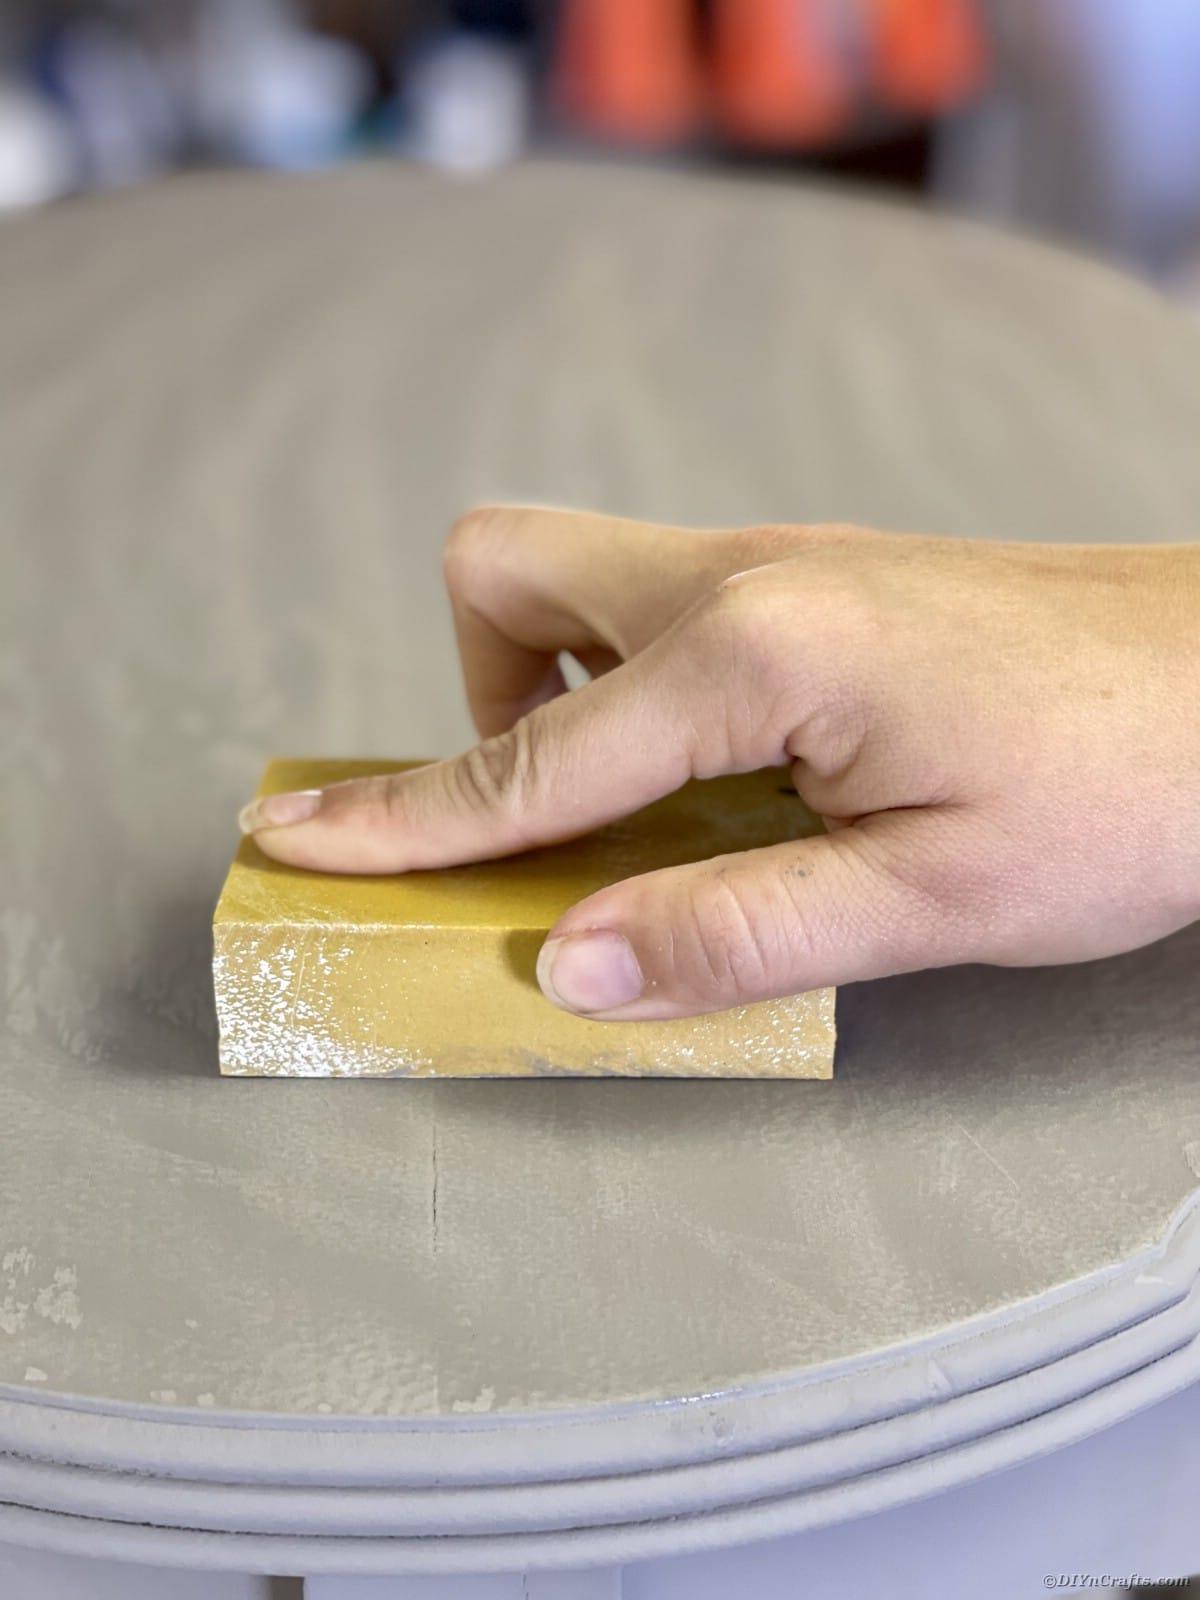 Hand holding sanding block on grey table